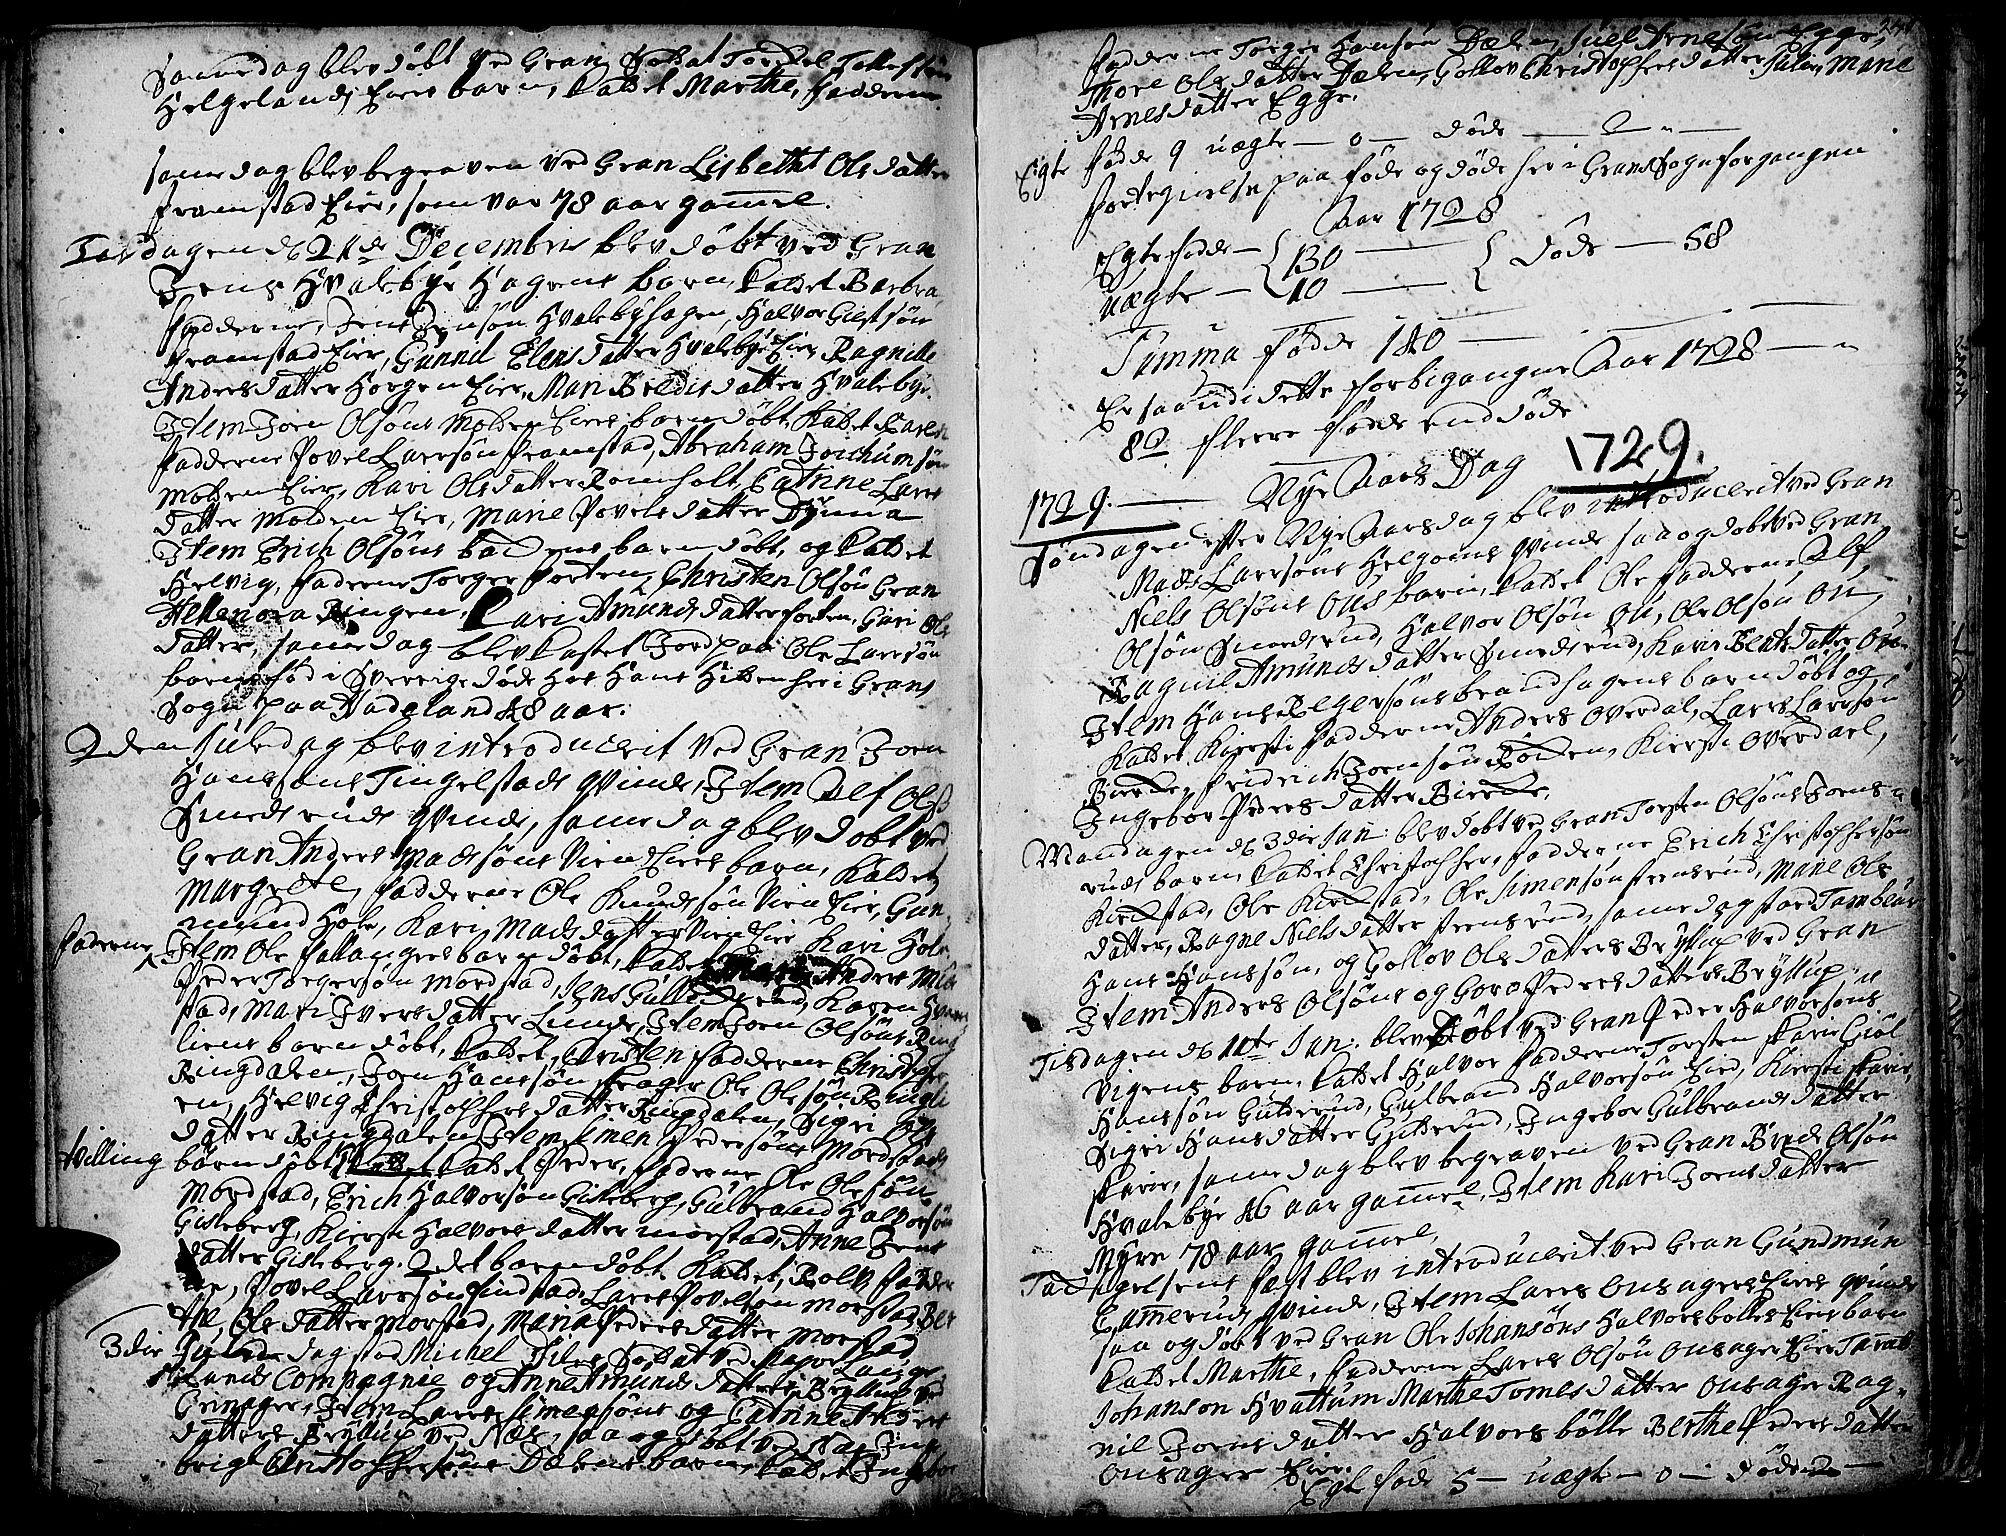 SAH, Gran prestekontor, Ministerialbok nr. 1, 1707-1731, s. 249